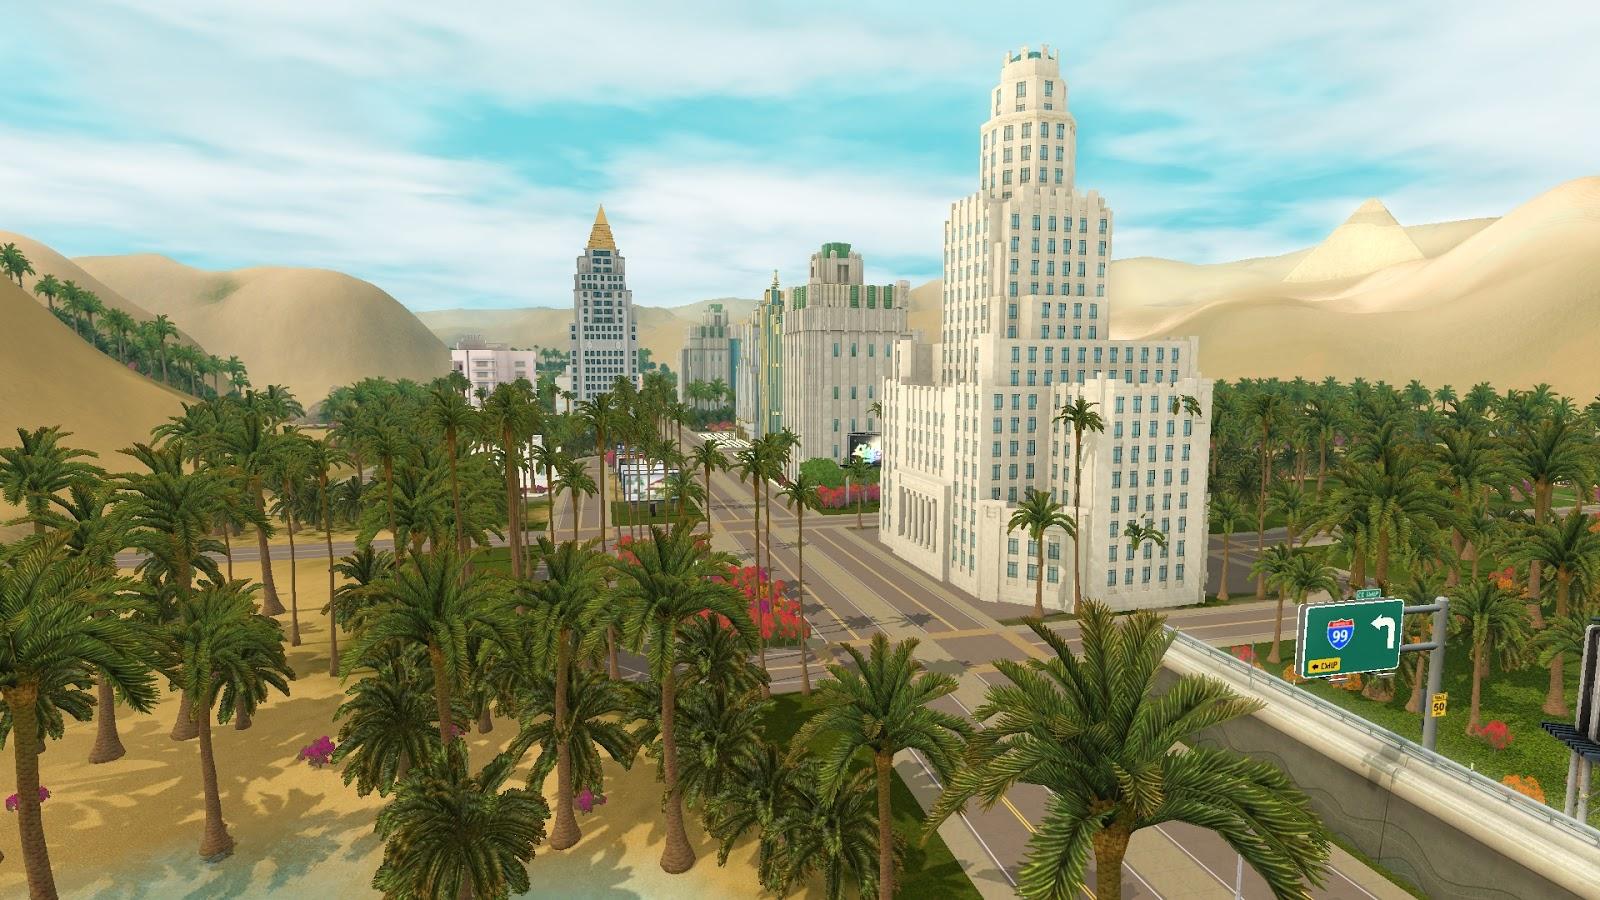 My Sims 3 Blog: Jan 3, 2014